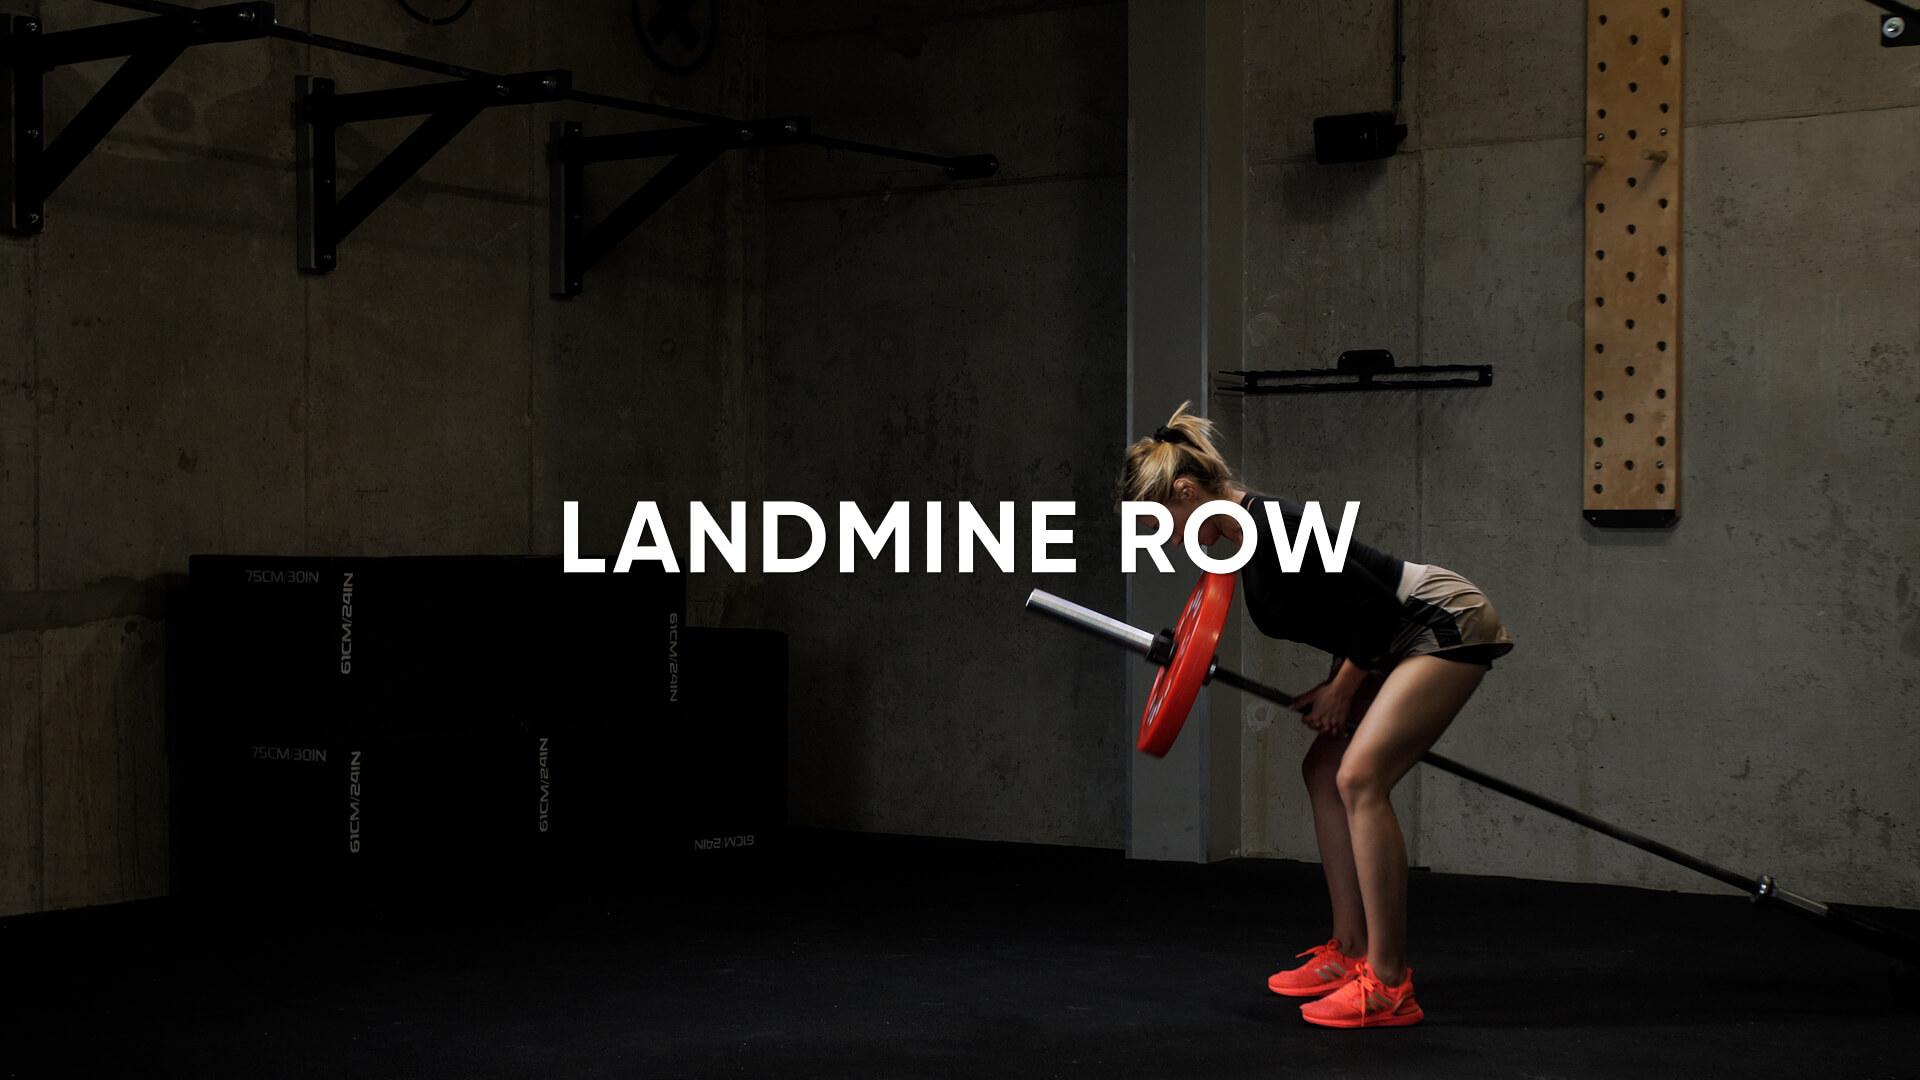 Landmine Row